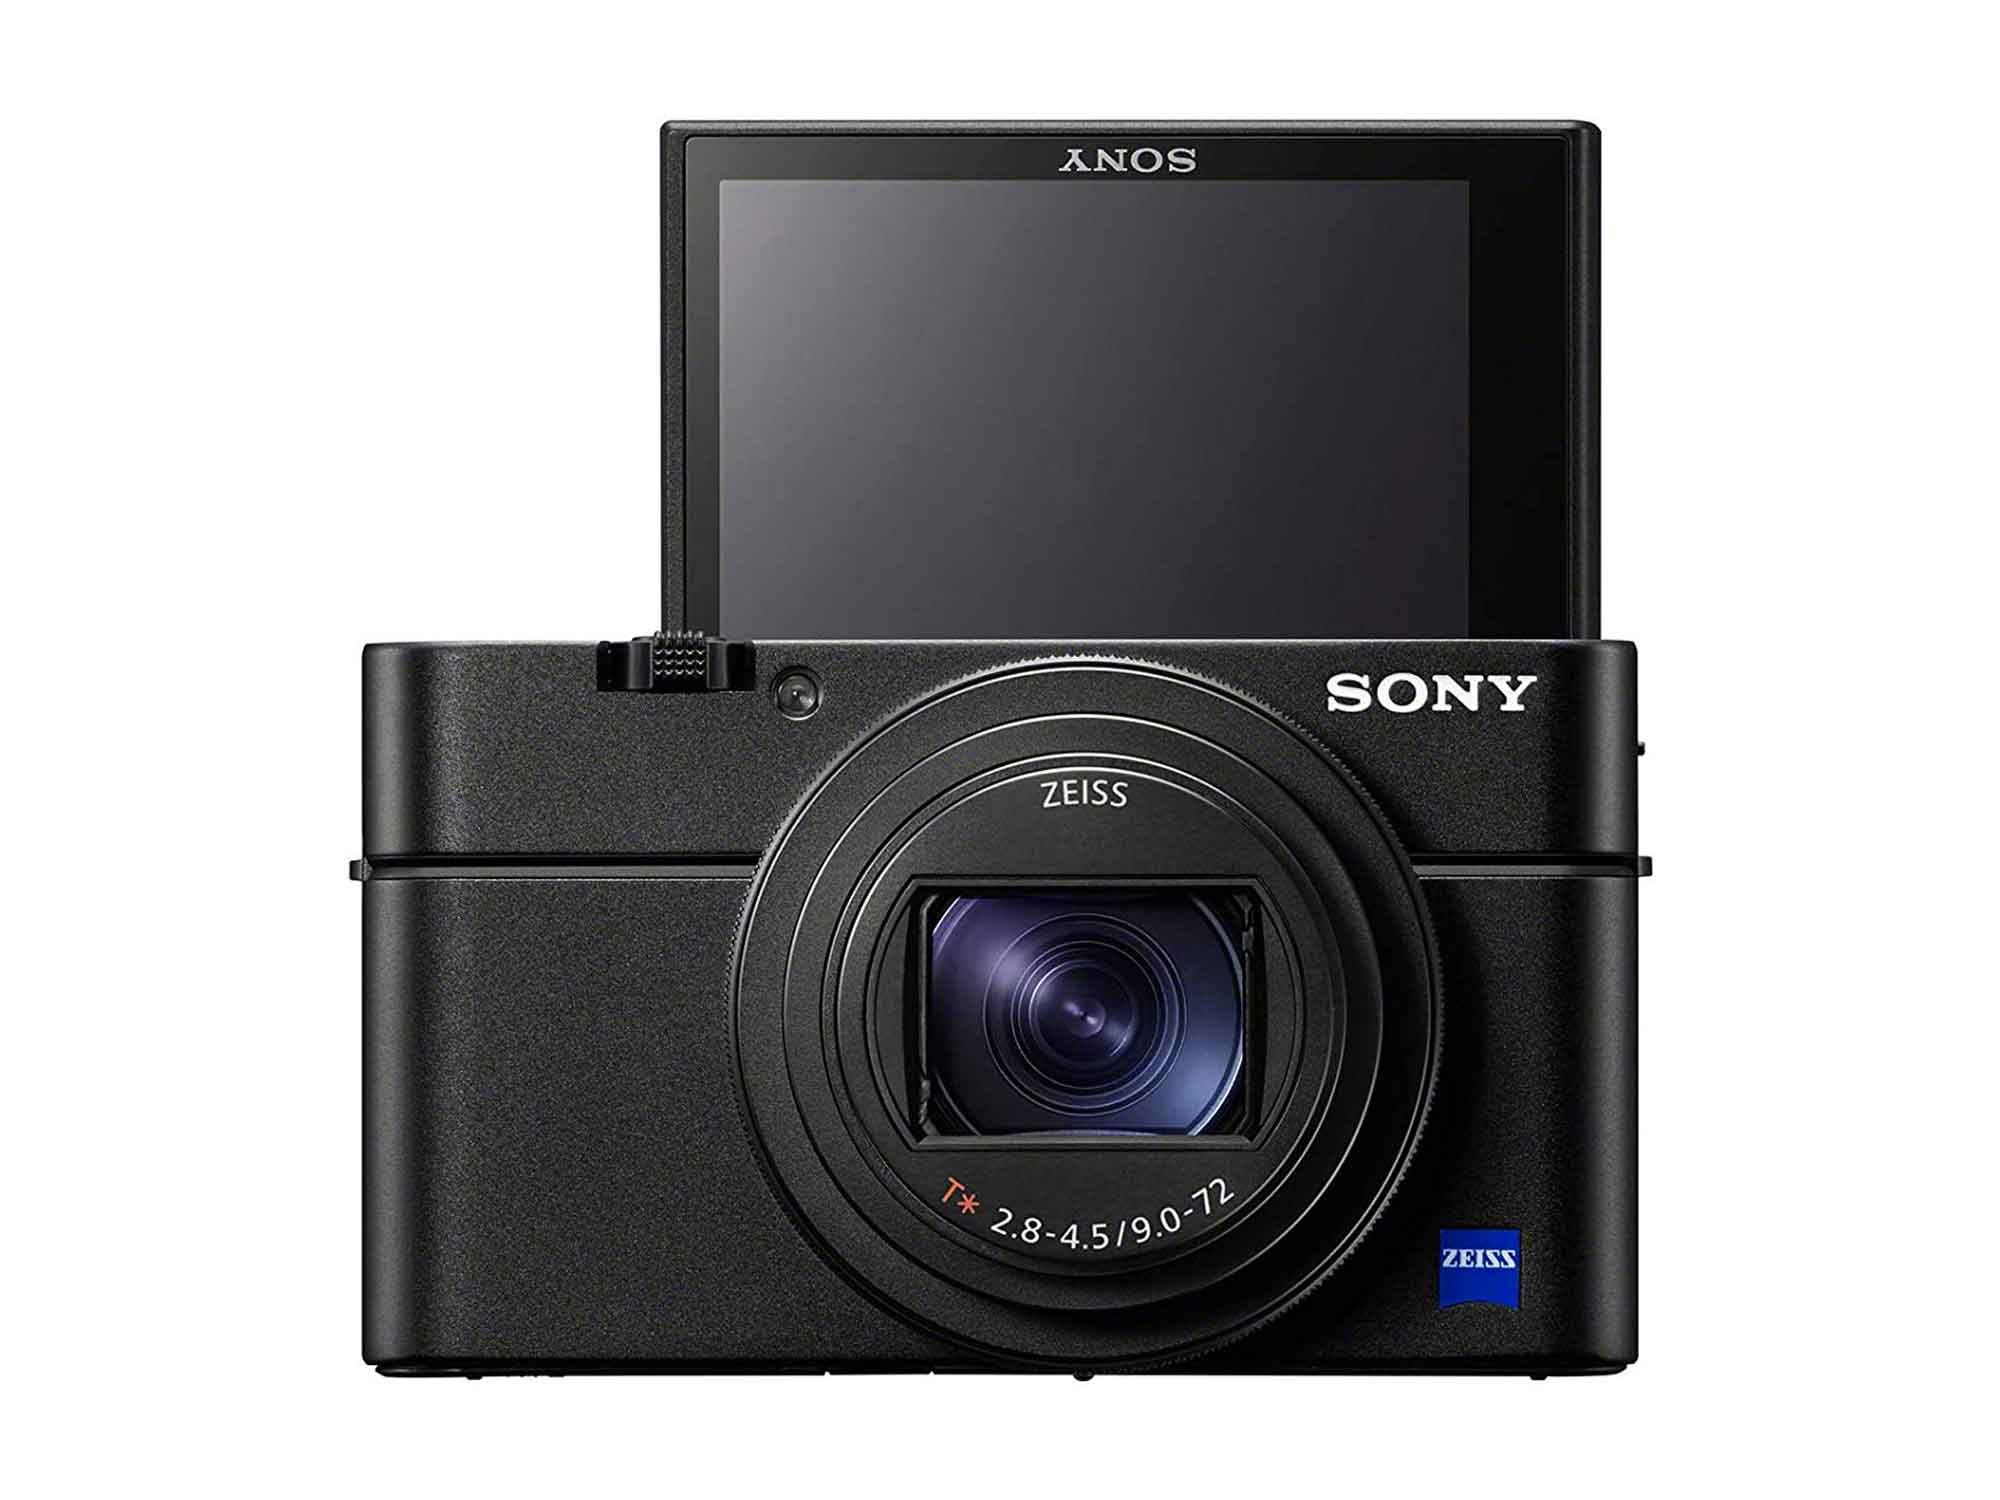 Sony RX100 digital camera